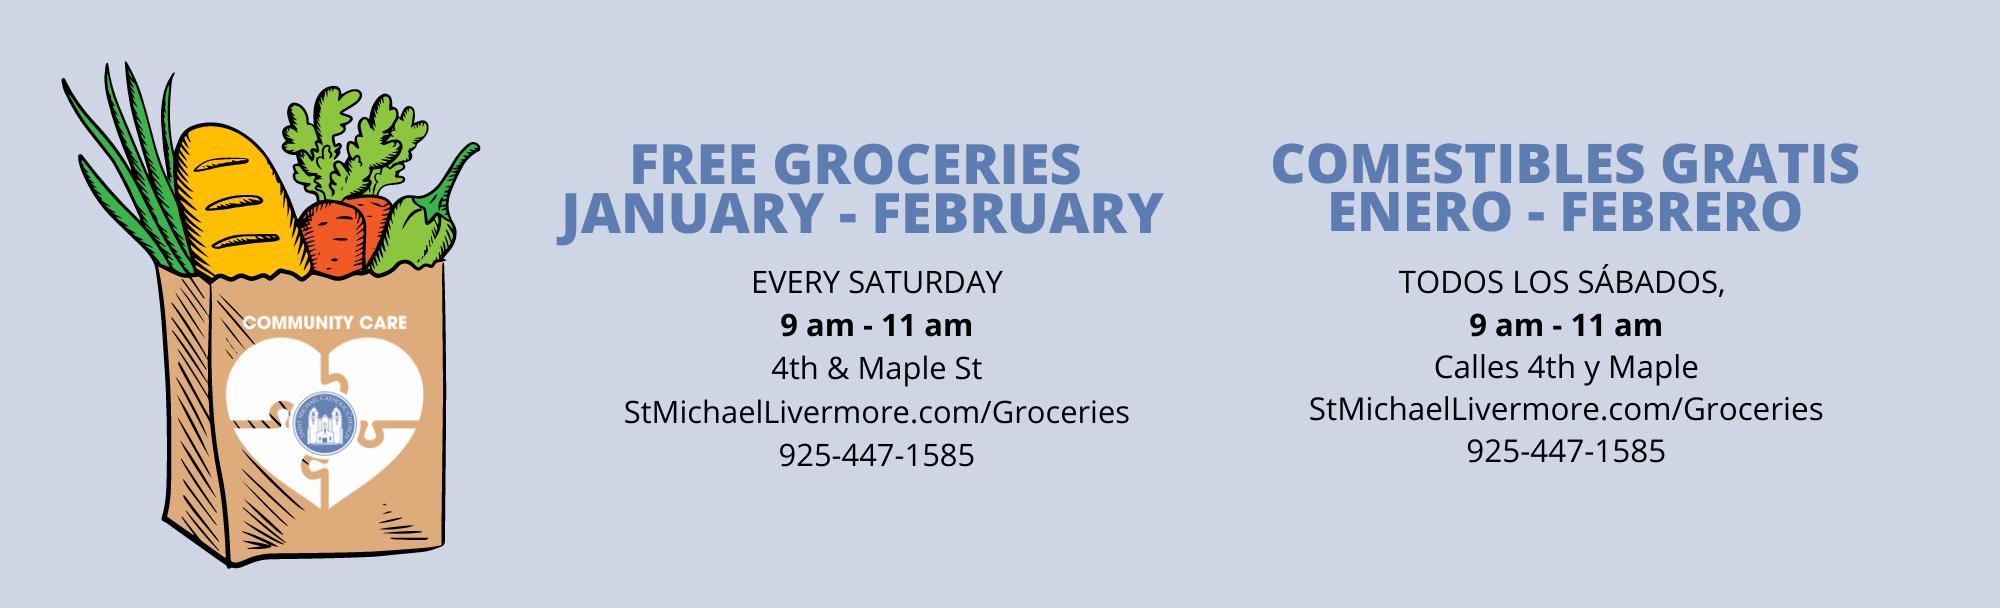 Free Groceries January February